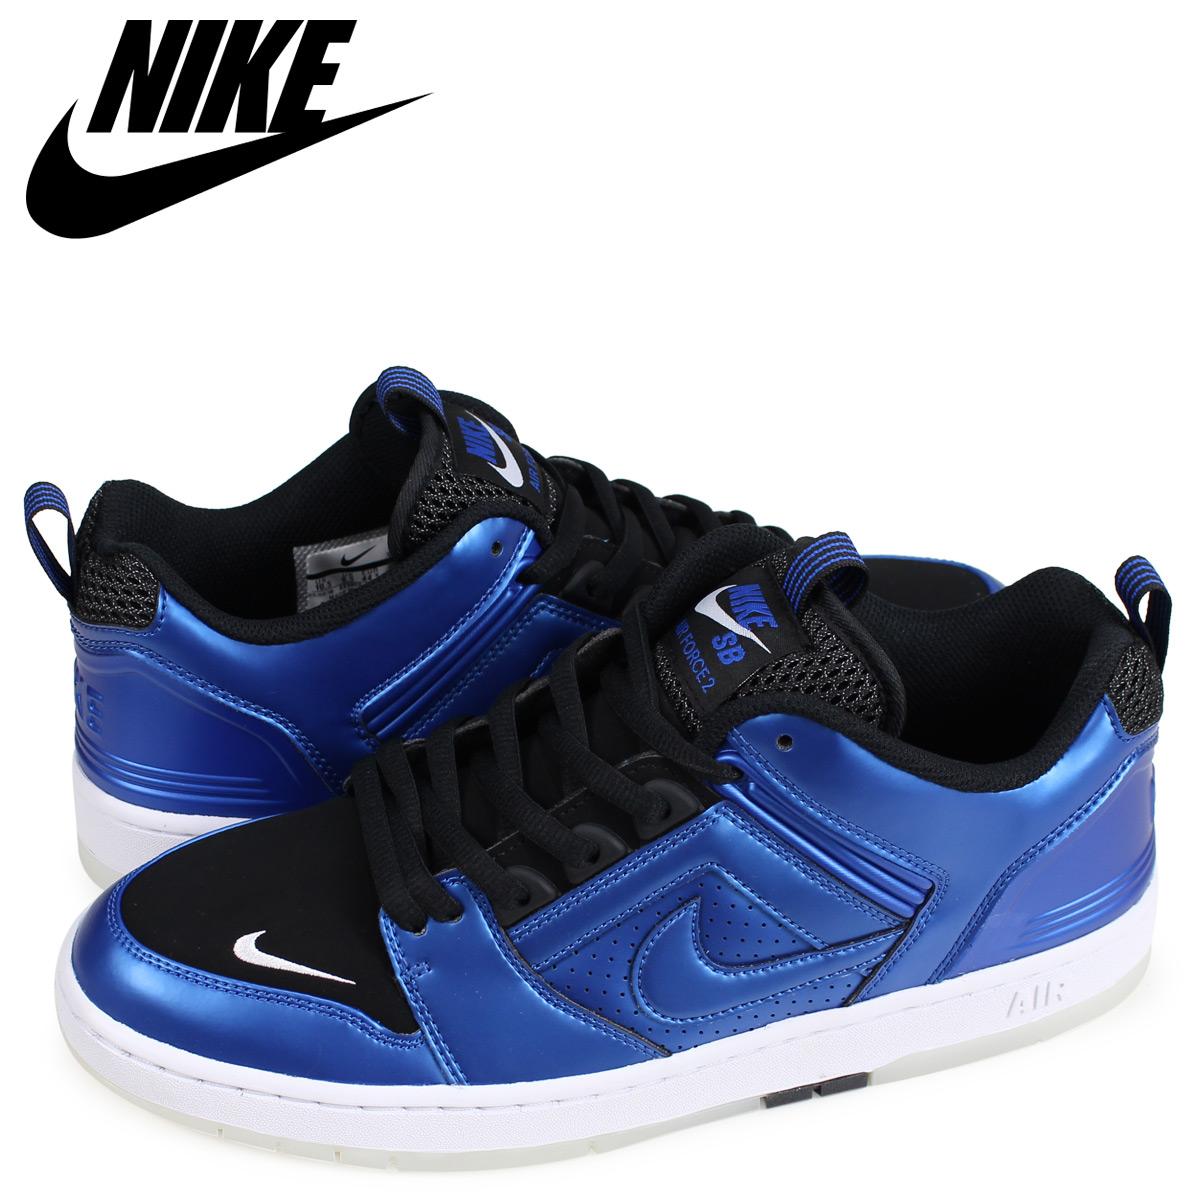 best sneakers 03b7c e3a08 NIKE Nike SB air force 2 sneakers men AIR FORCE 2 LOW FOAMPOSITE 1 blue  AV3800-440